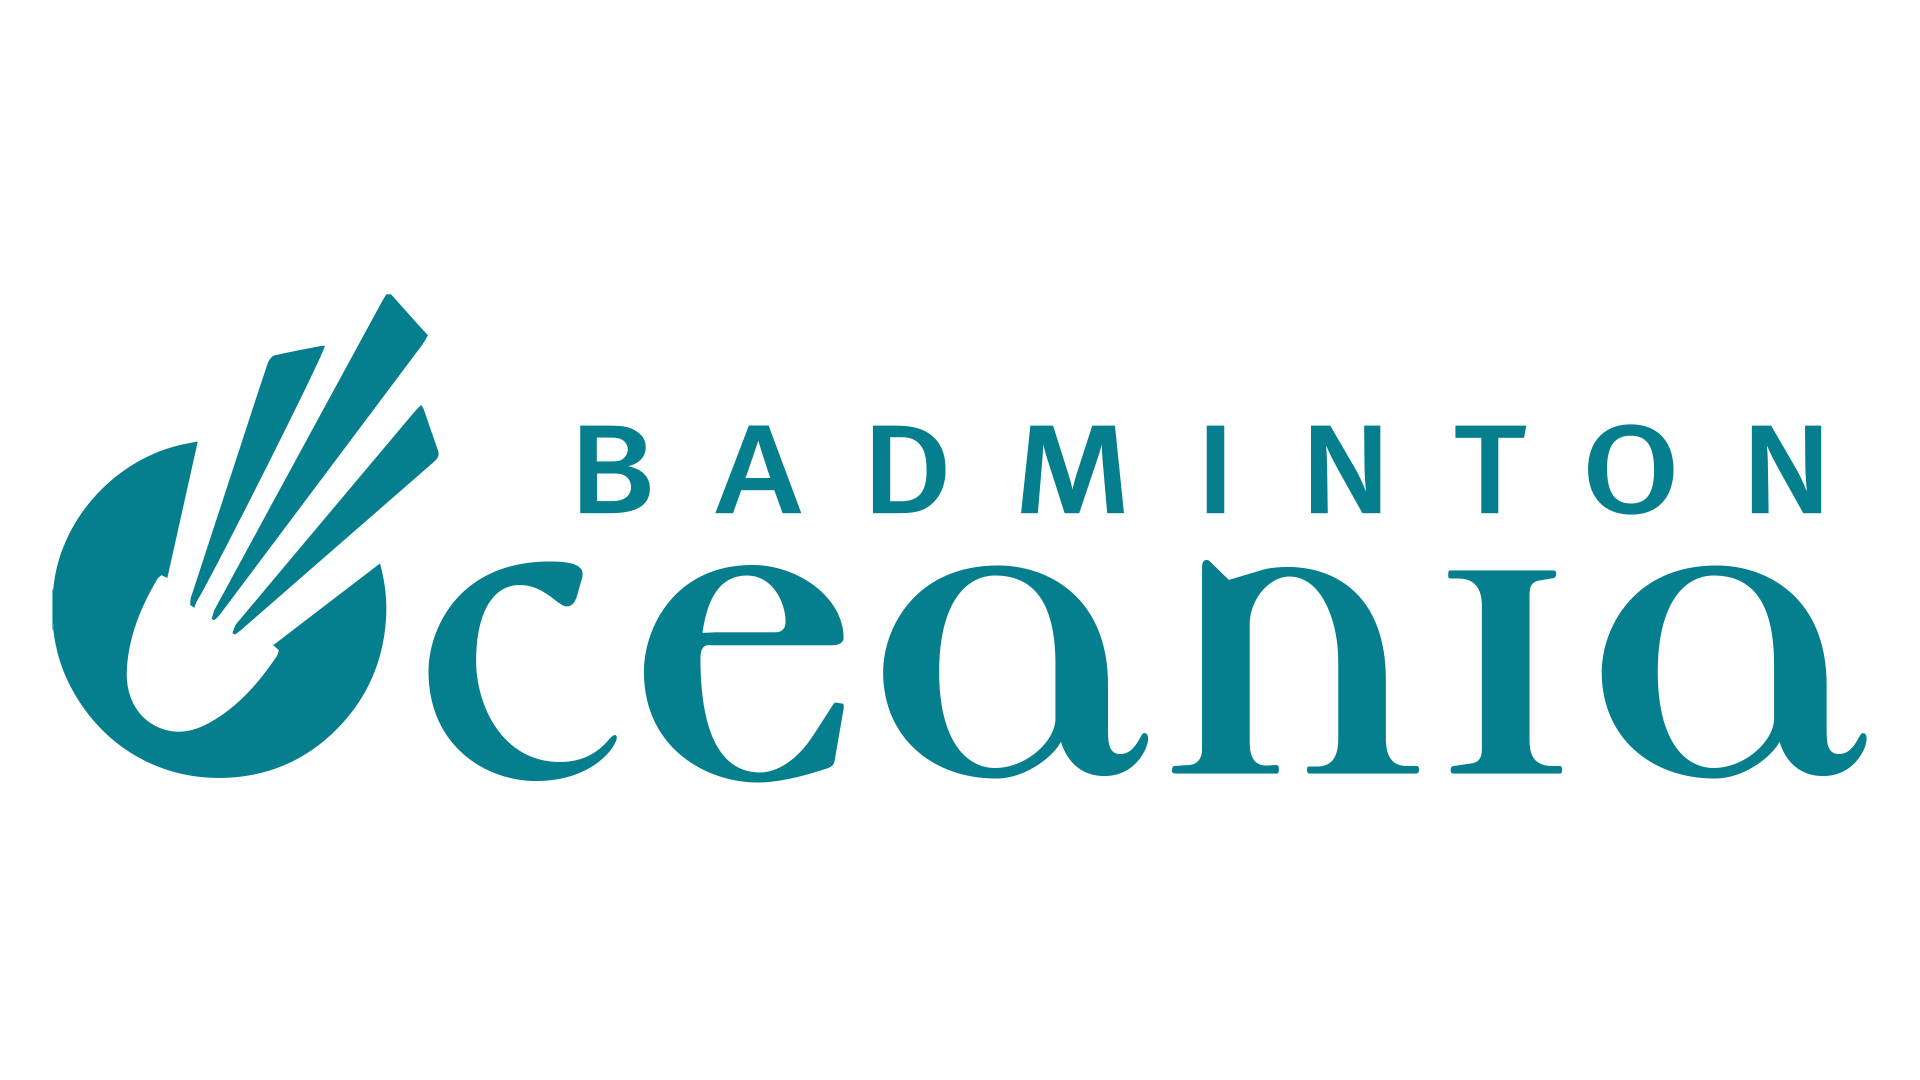 Badminton-Oceania-2